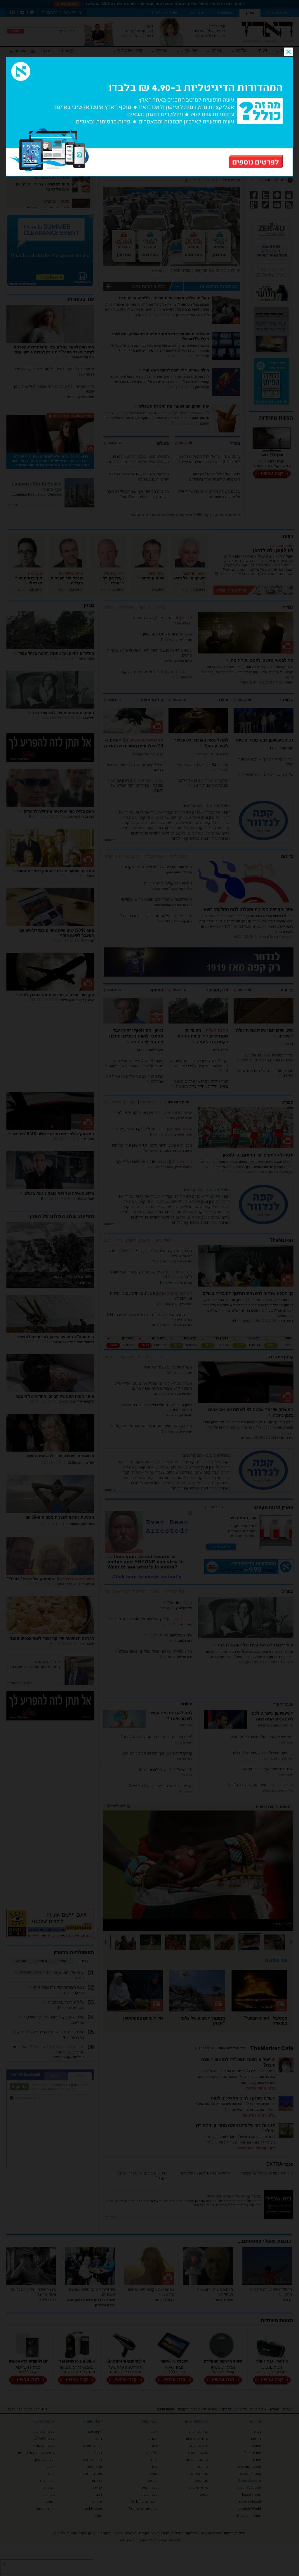 Haaretz at Monday Sept. 2, 2013, 11:09 a.m. UTC